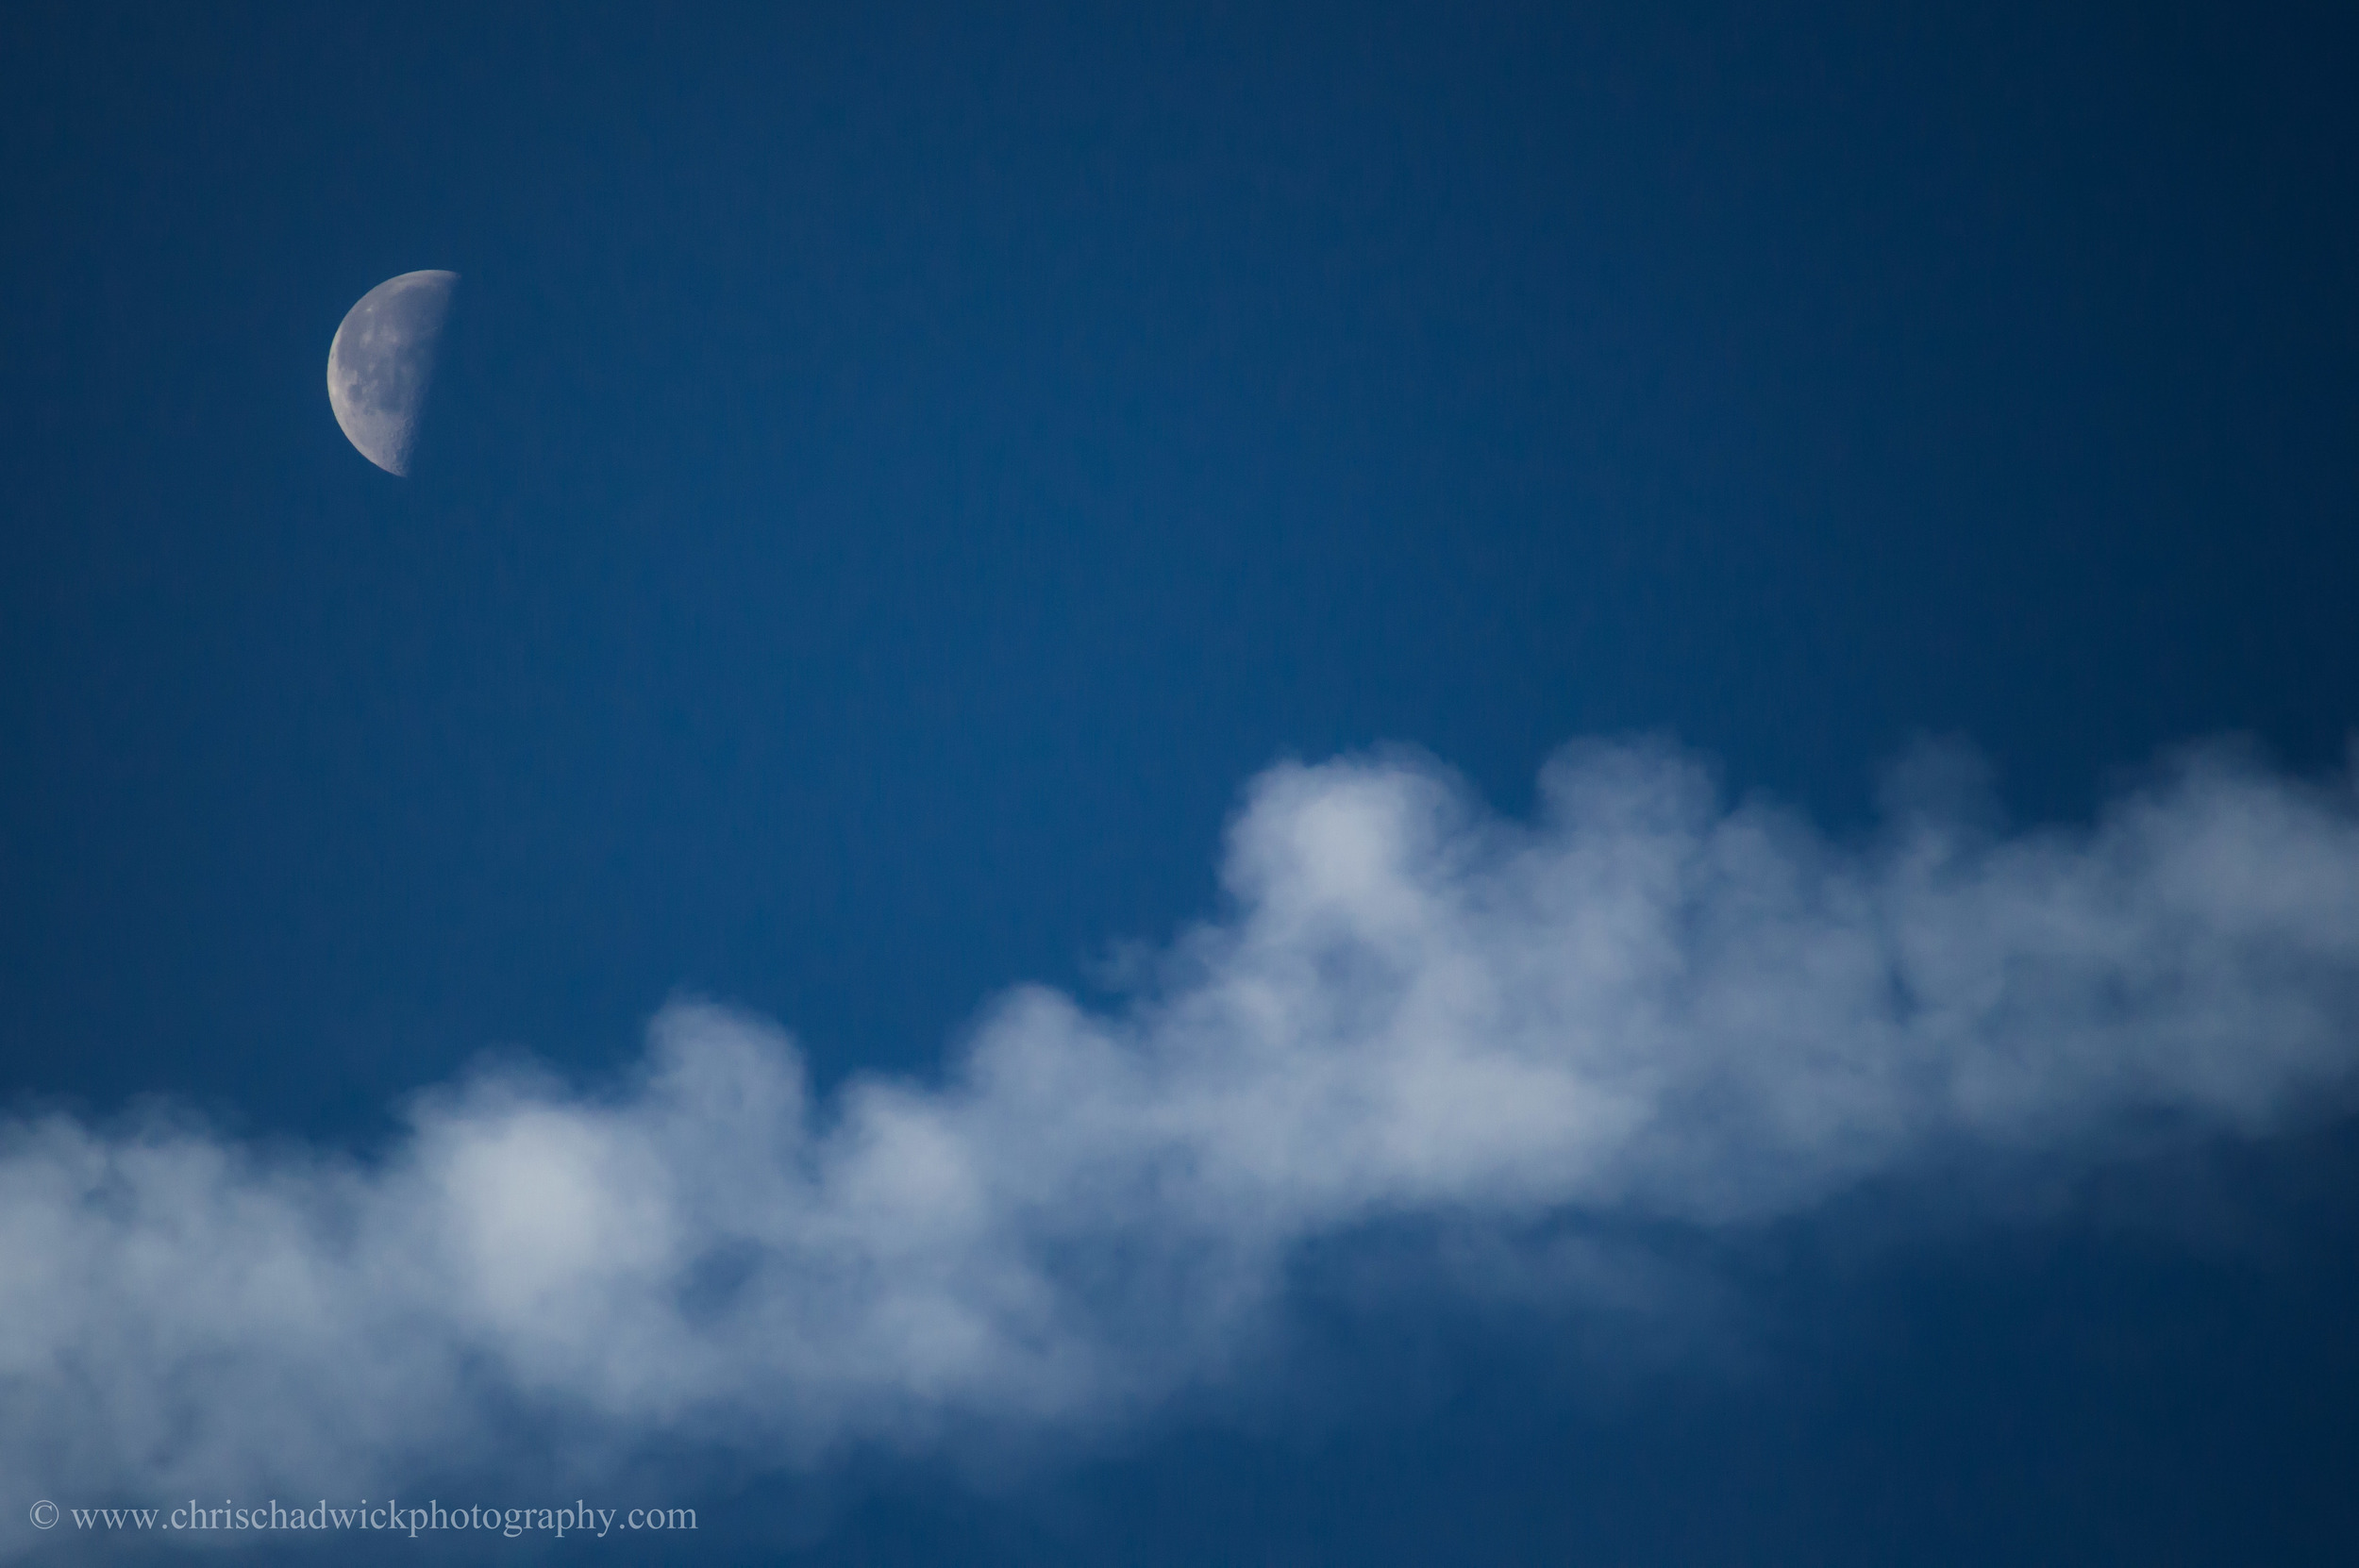 Moon_&_vapour_trail.jpg